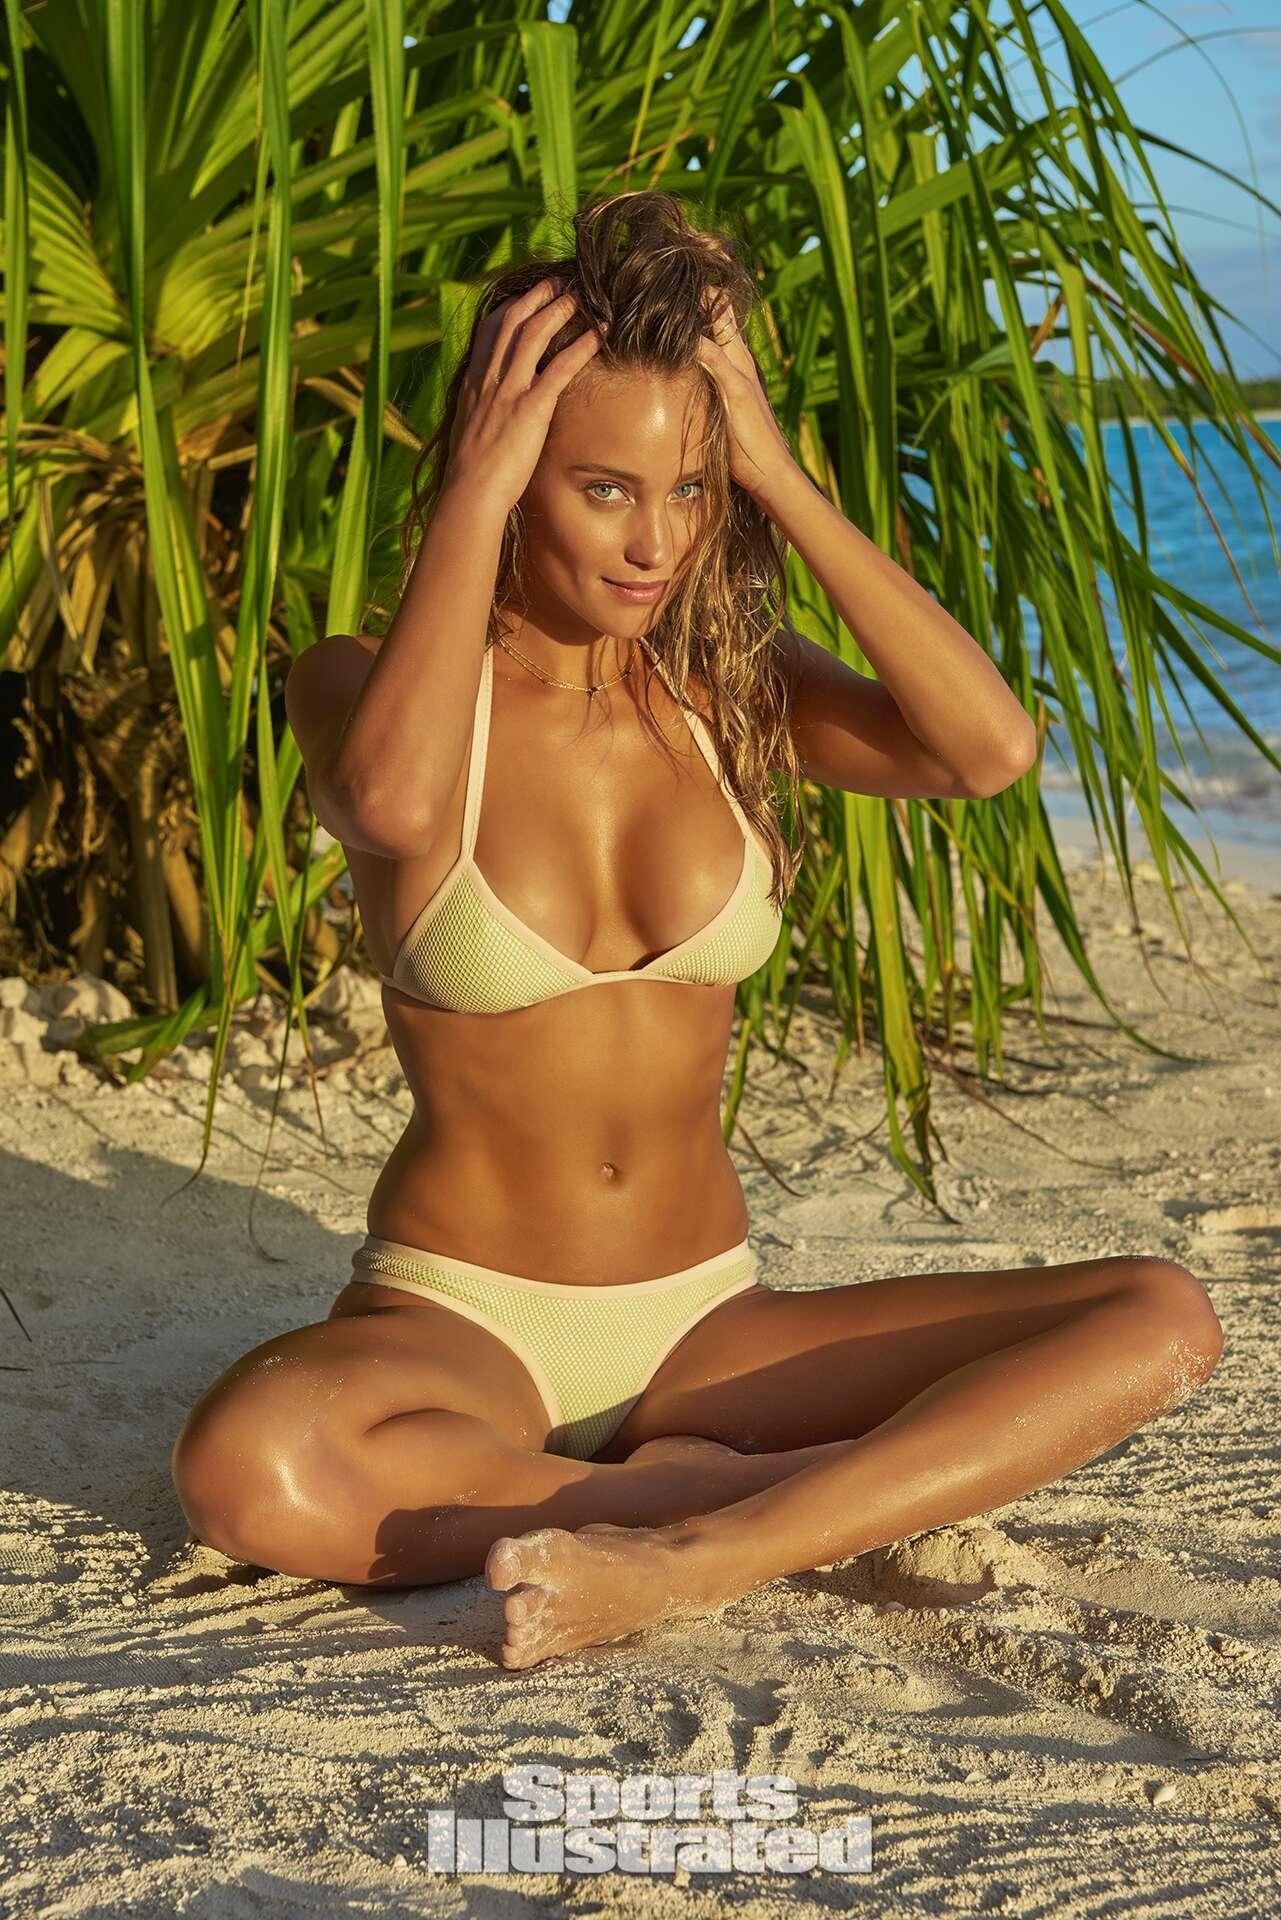 Hannah Davis was photographed by Yu Tsai in The Islands Of Tahiti. Swimsuit by Ola Vida.